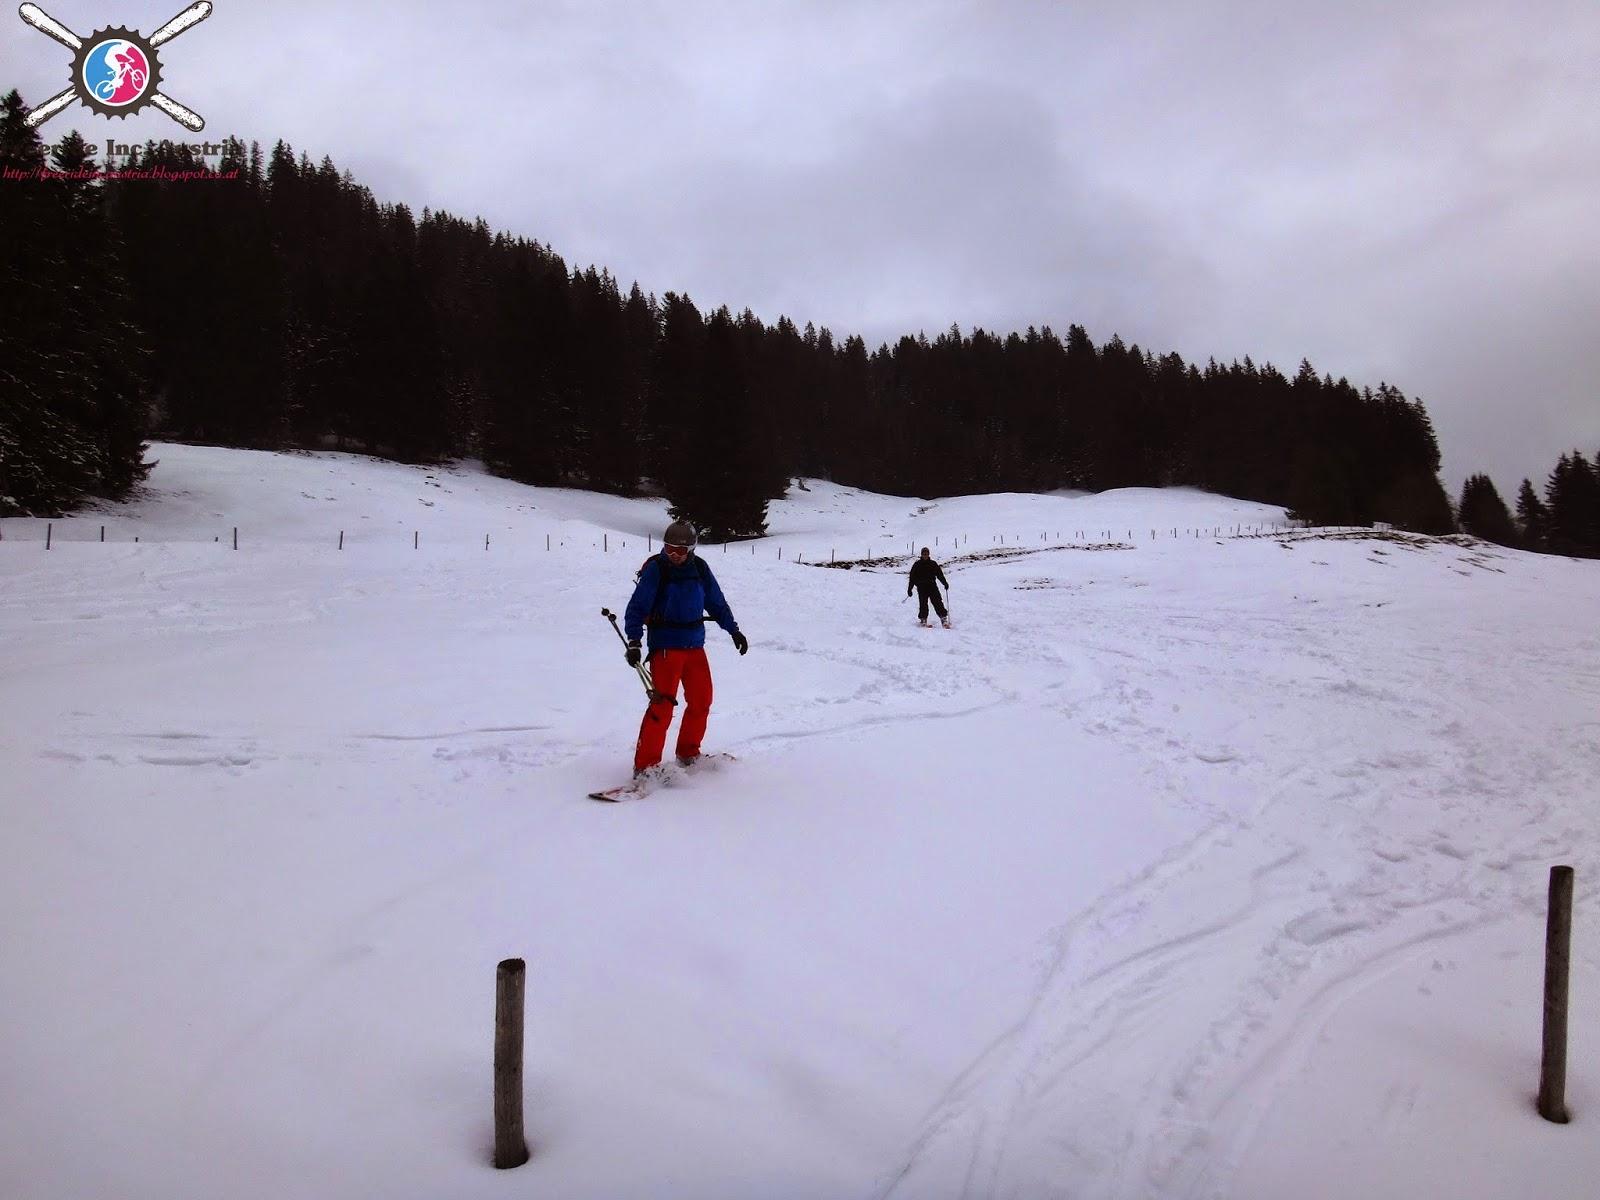 Apres Ski  Aschau im Chiemgau